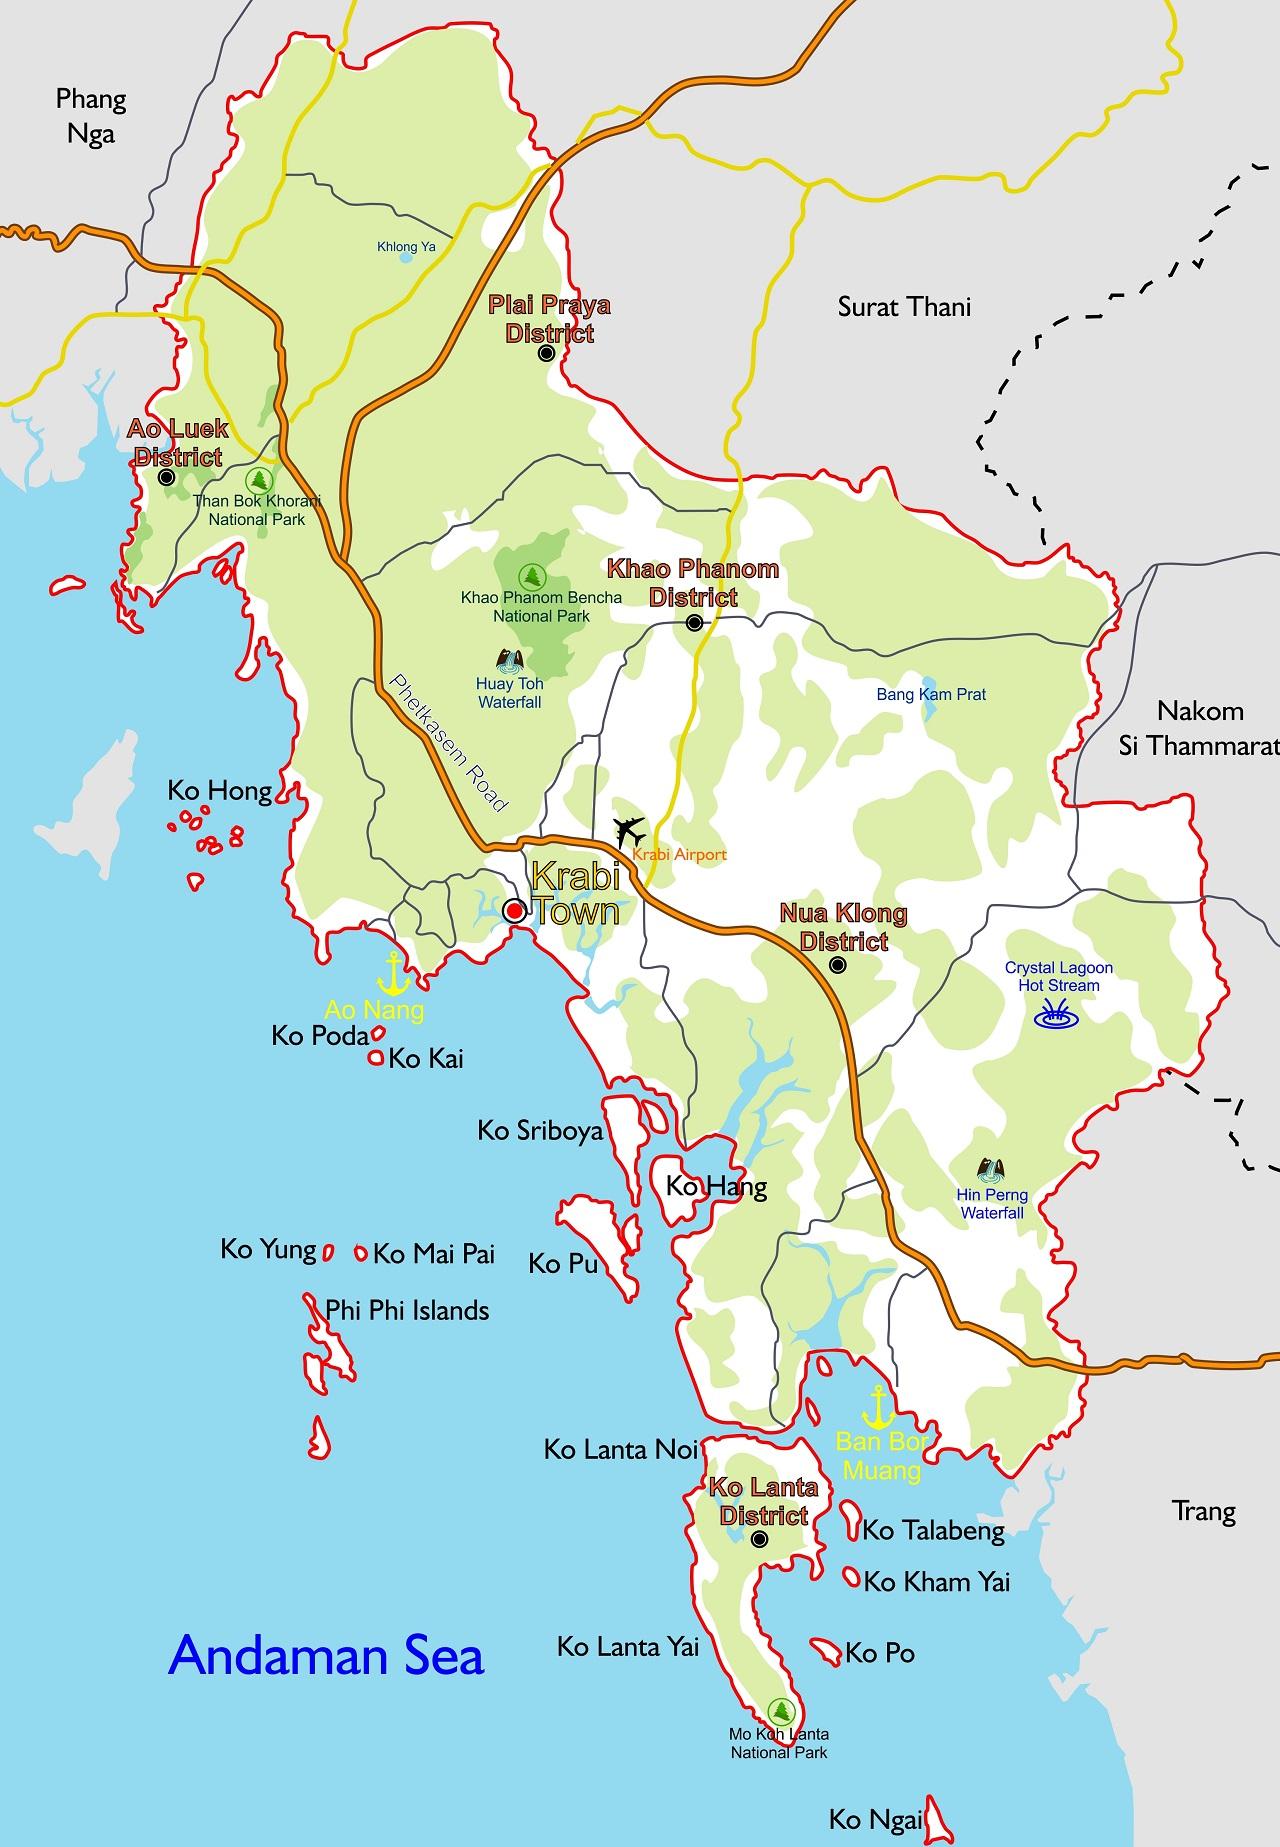 Map Of Krabi | Map Of West Krabi Island Map on batam island map, cebu island map, hong kong island map, vancouver island map, amsterdam island map, bintan island map, koh mook island map, phu quoc island map, racha island map, samui island map, redang island map, thailand island map, surin island map, lombok island map, bali island map, koh phangan map, tioman island map, taipei island map, phuket map, paris island map,